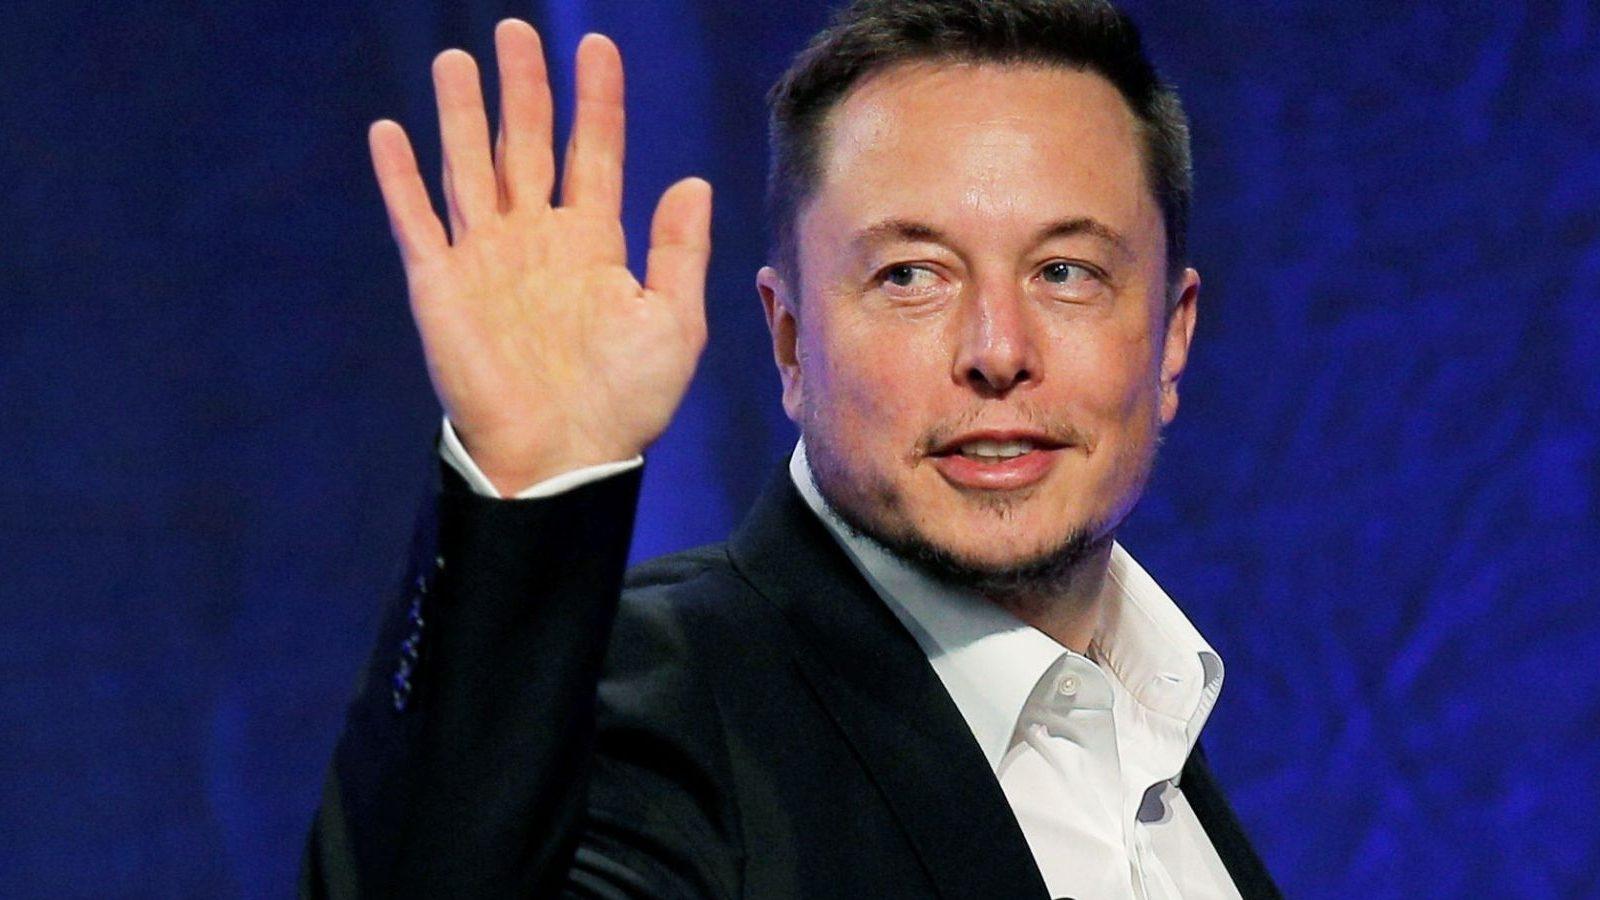 https://fortuneinsight.com/web/wp-content/uploads/2019/03/Musk-deletes-Fortnite.jpg